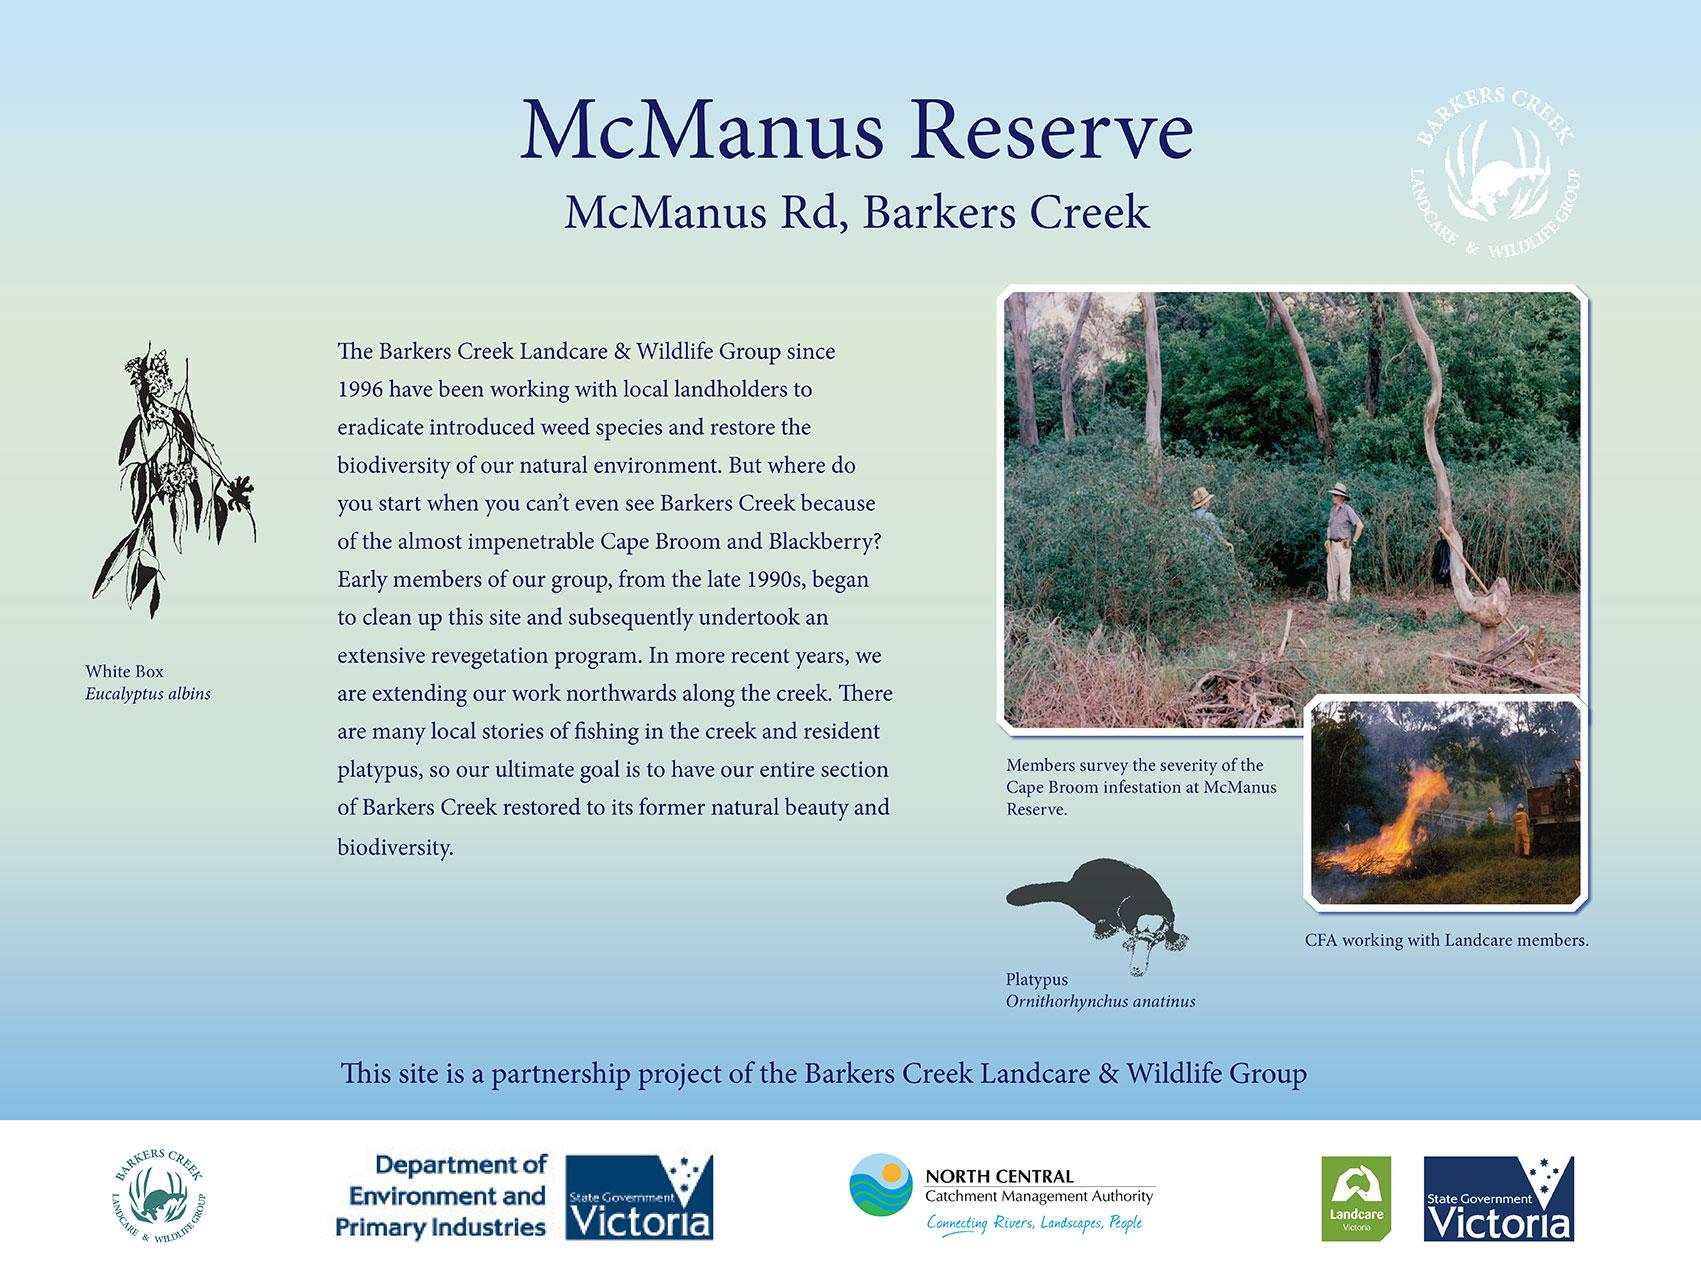 Signage at McManus Reserve